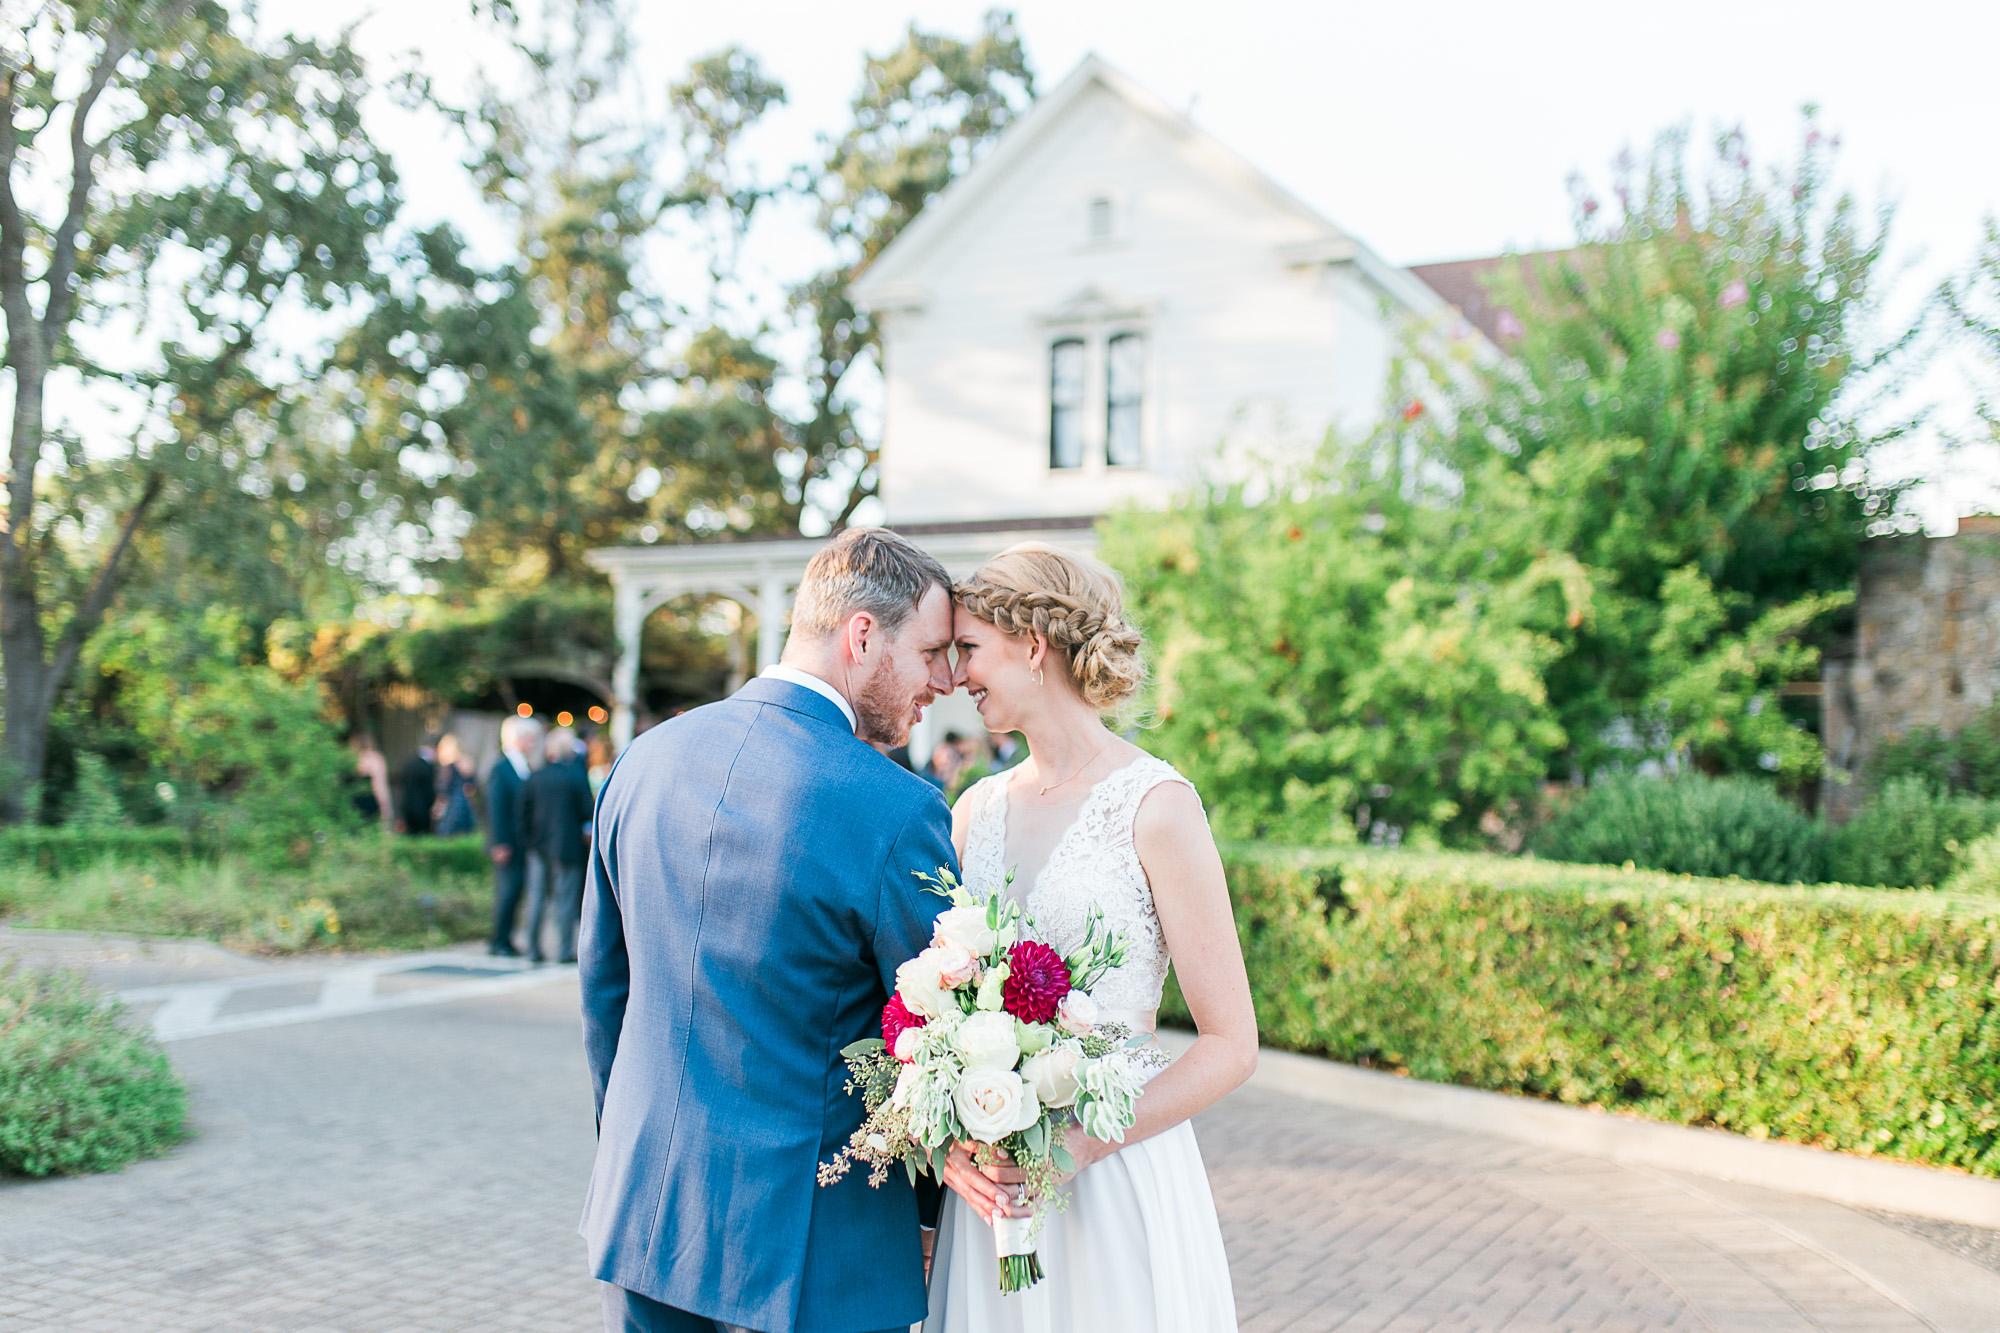 Generals Daughter Wedding Photos by JBJ Pictures - Ramekins Wedding Venue Photographer in Sonoma, Napa (29).jpg